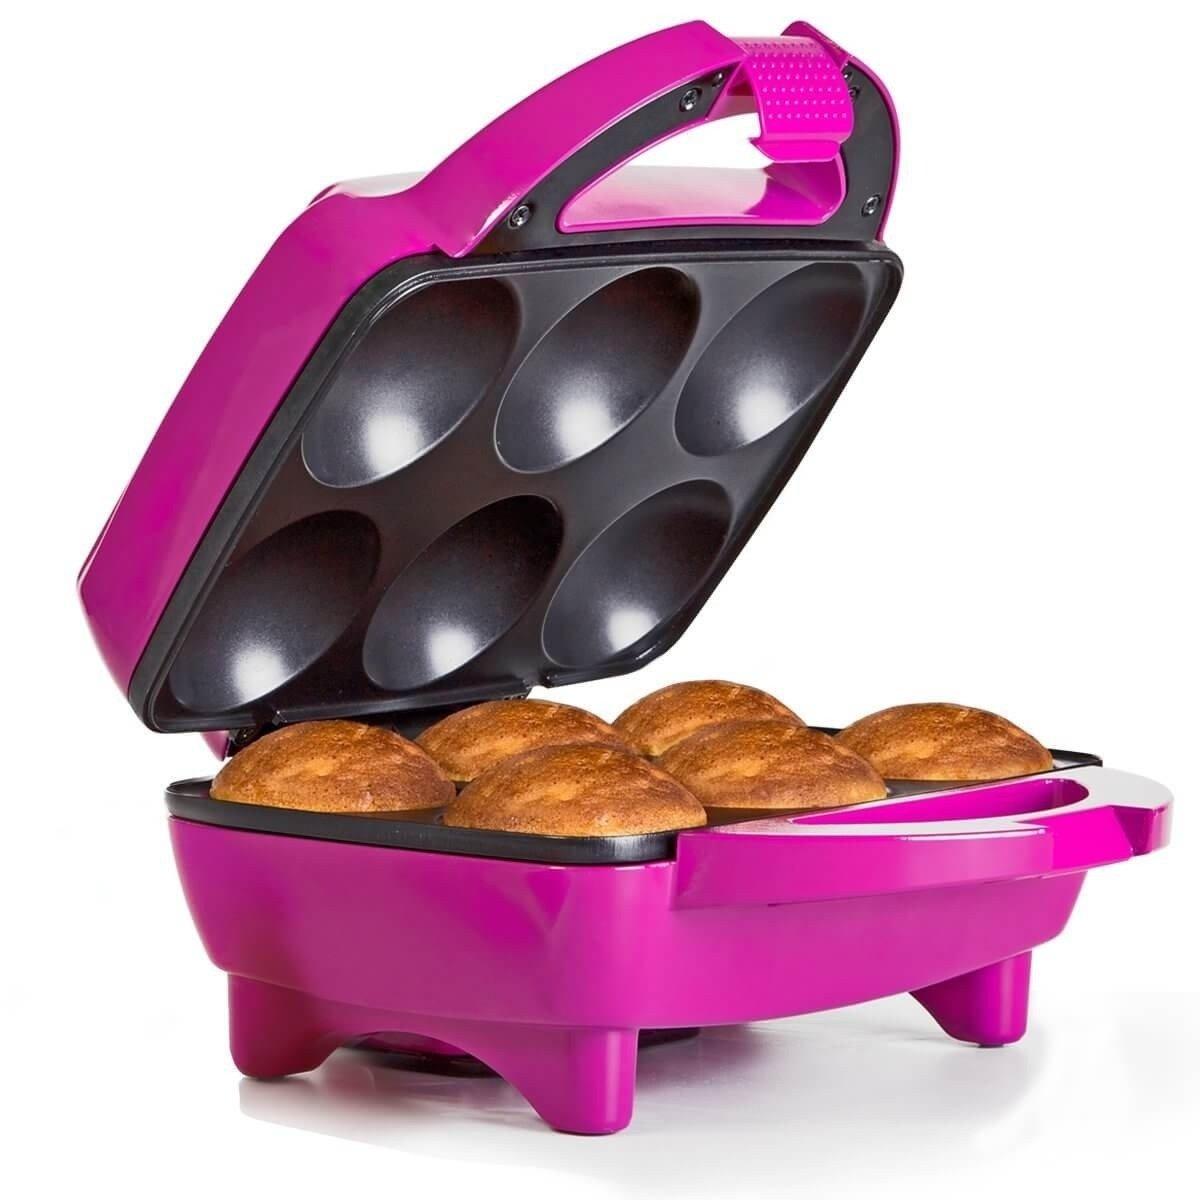 10 Stylish Birthday Gift Ideas For 11 Yr Old Girl birthday presents for 11 year olds best of birthday gift idea for 2021